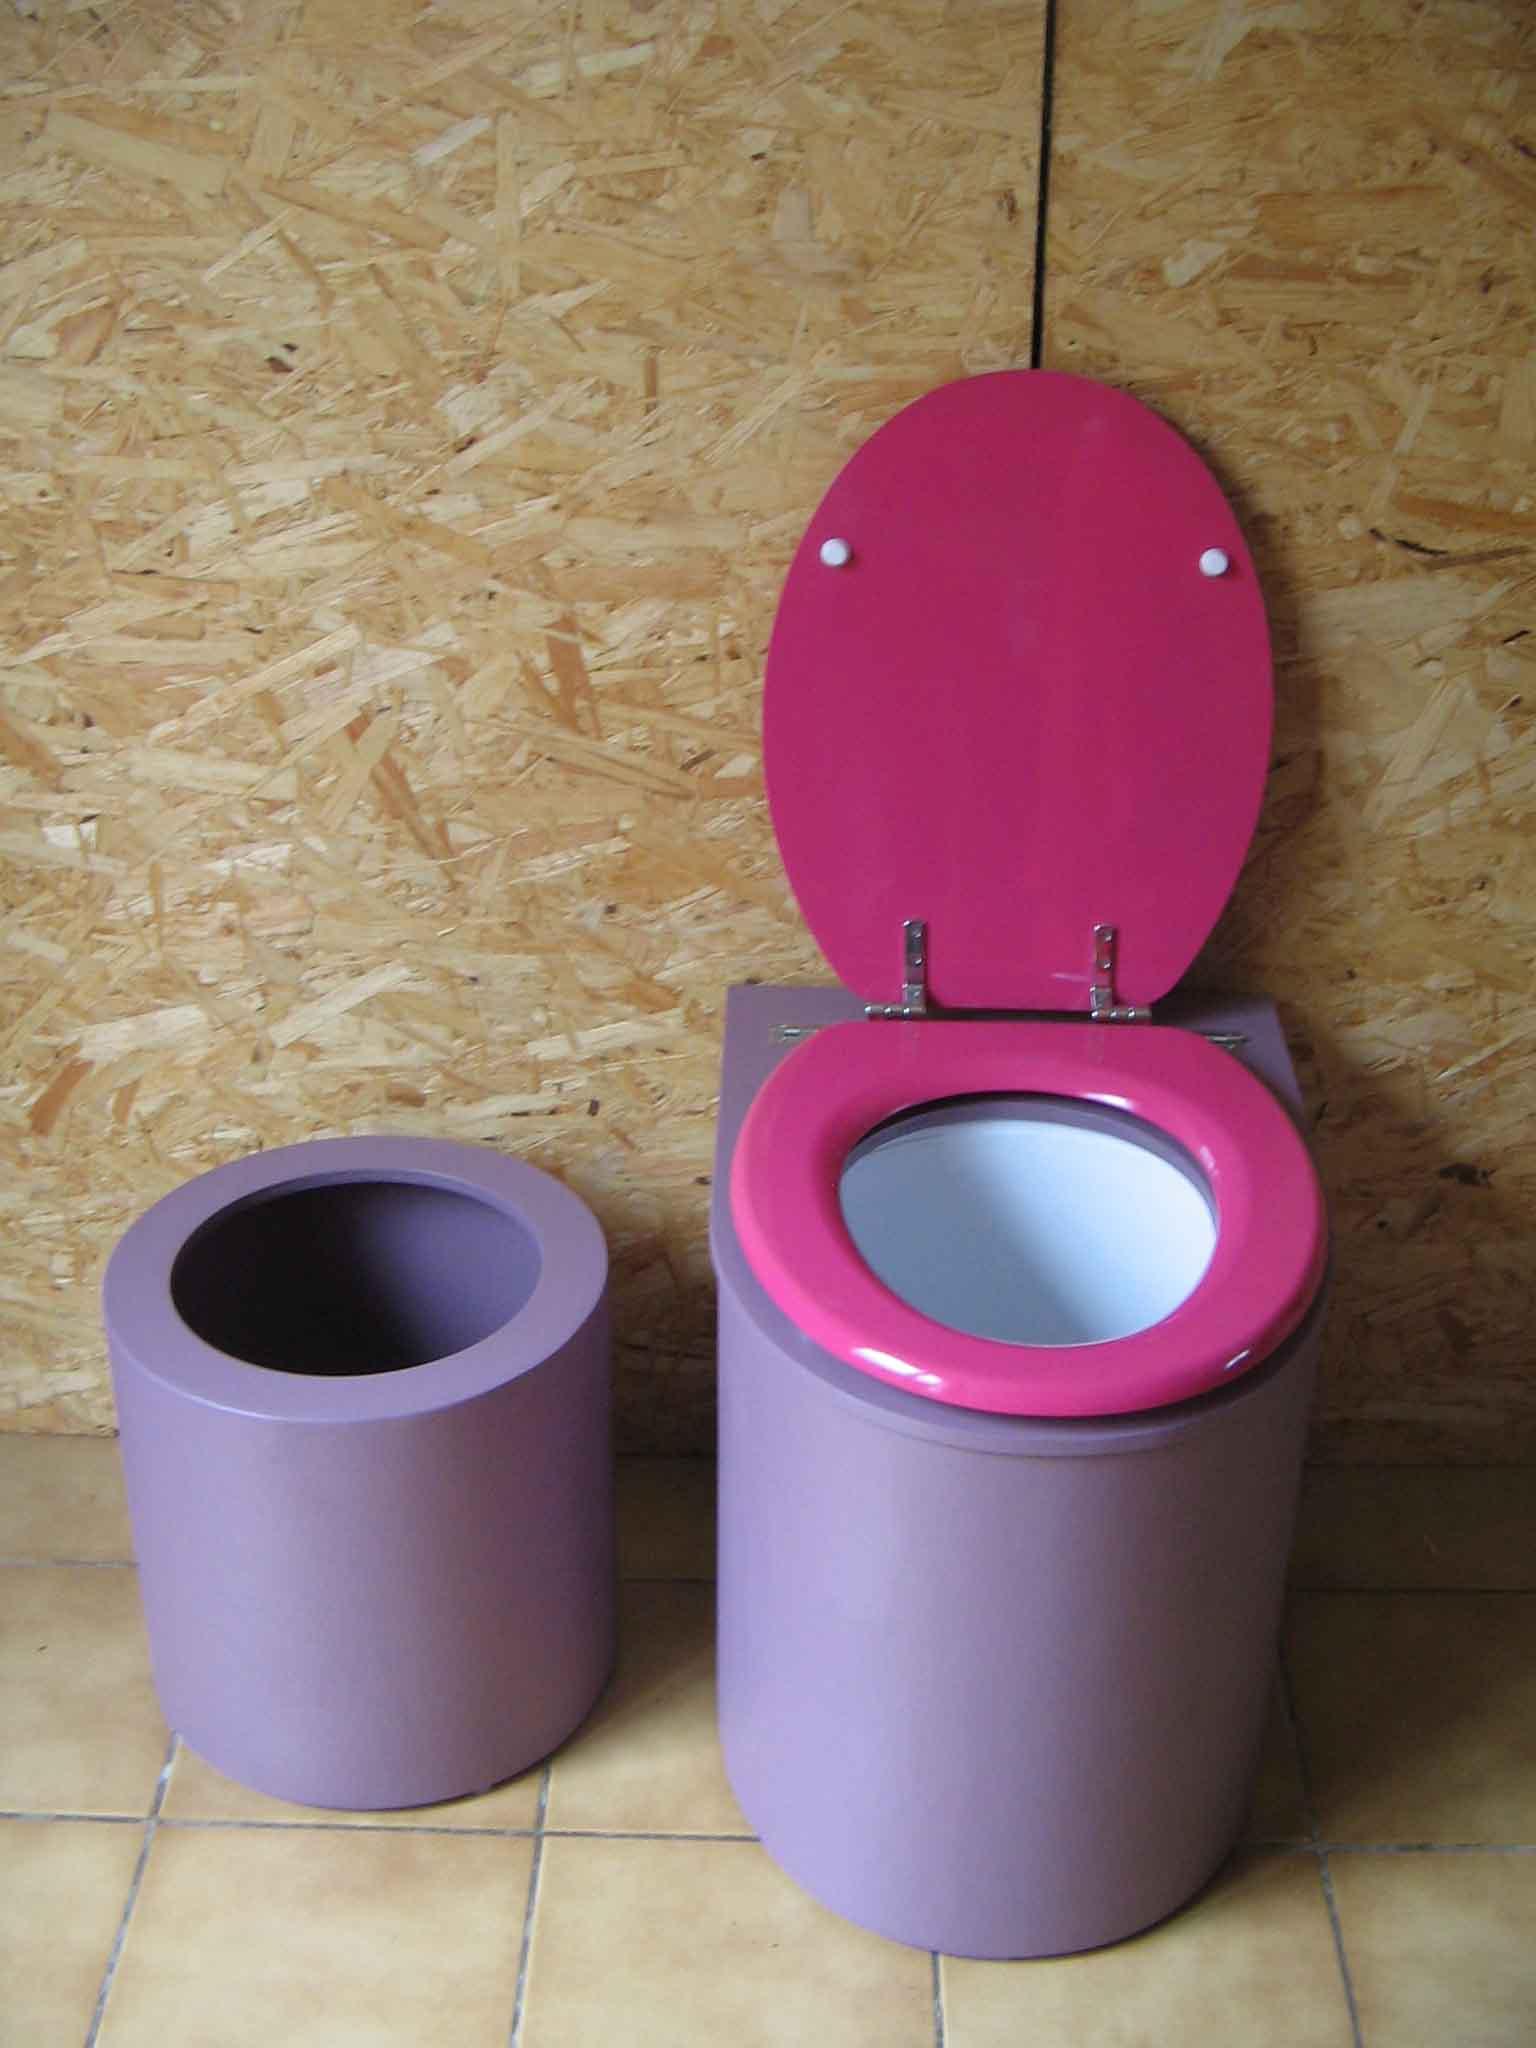 Toilette Seche Moderne | Fabulous Toilettes avec Toilette Seches